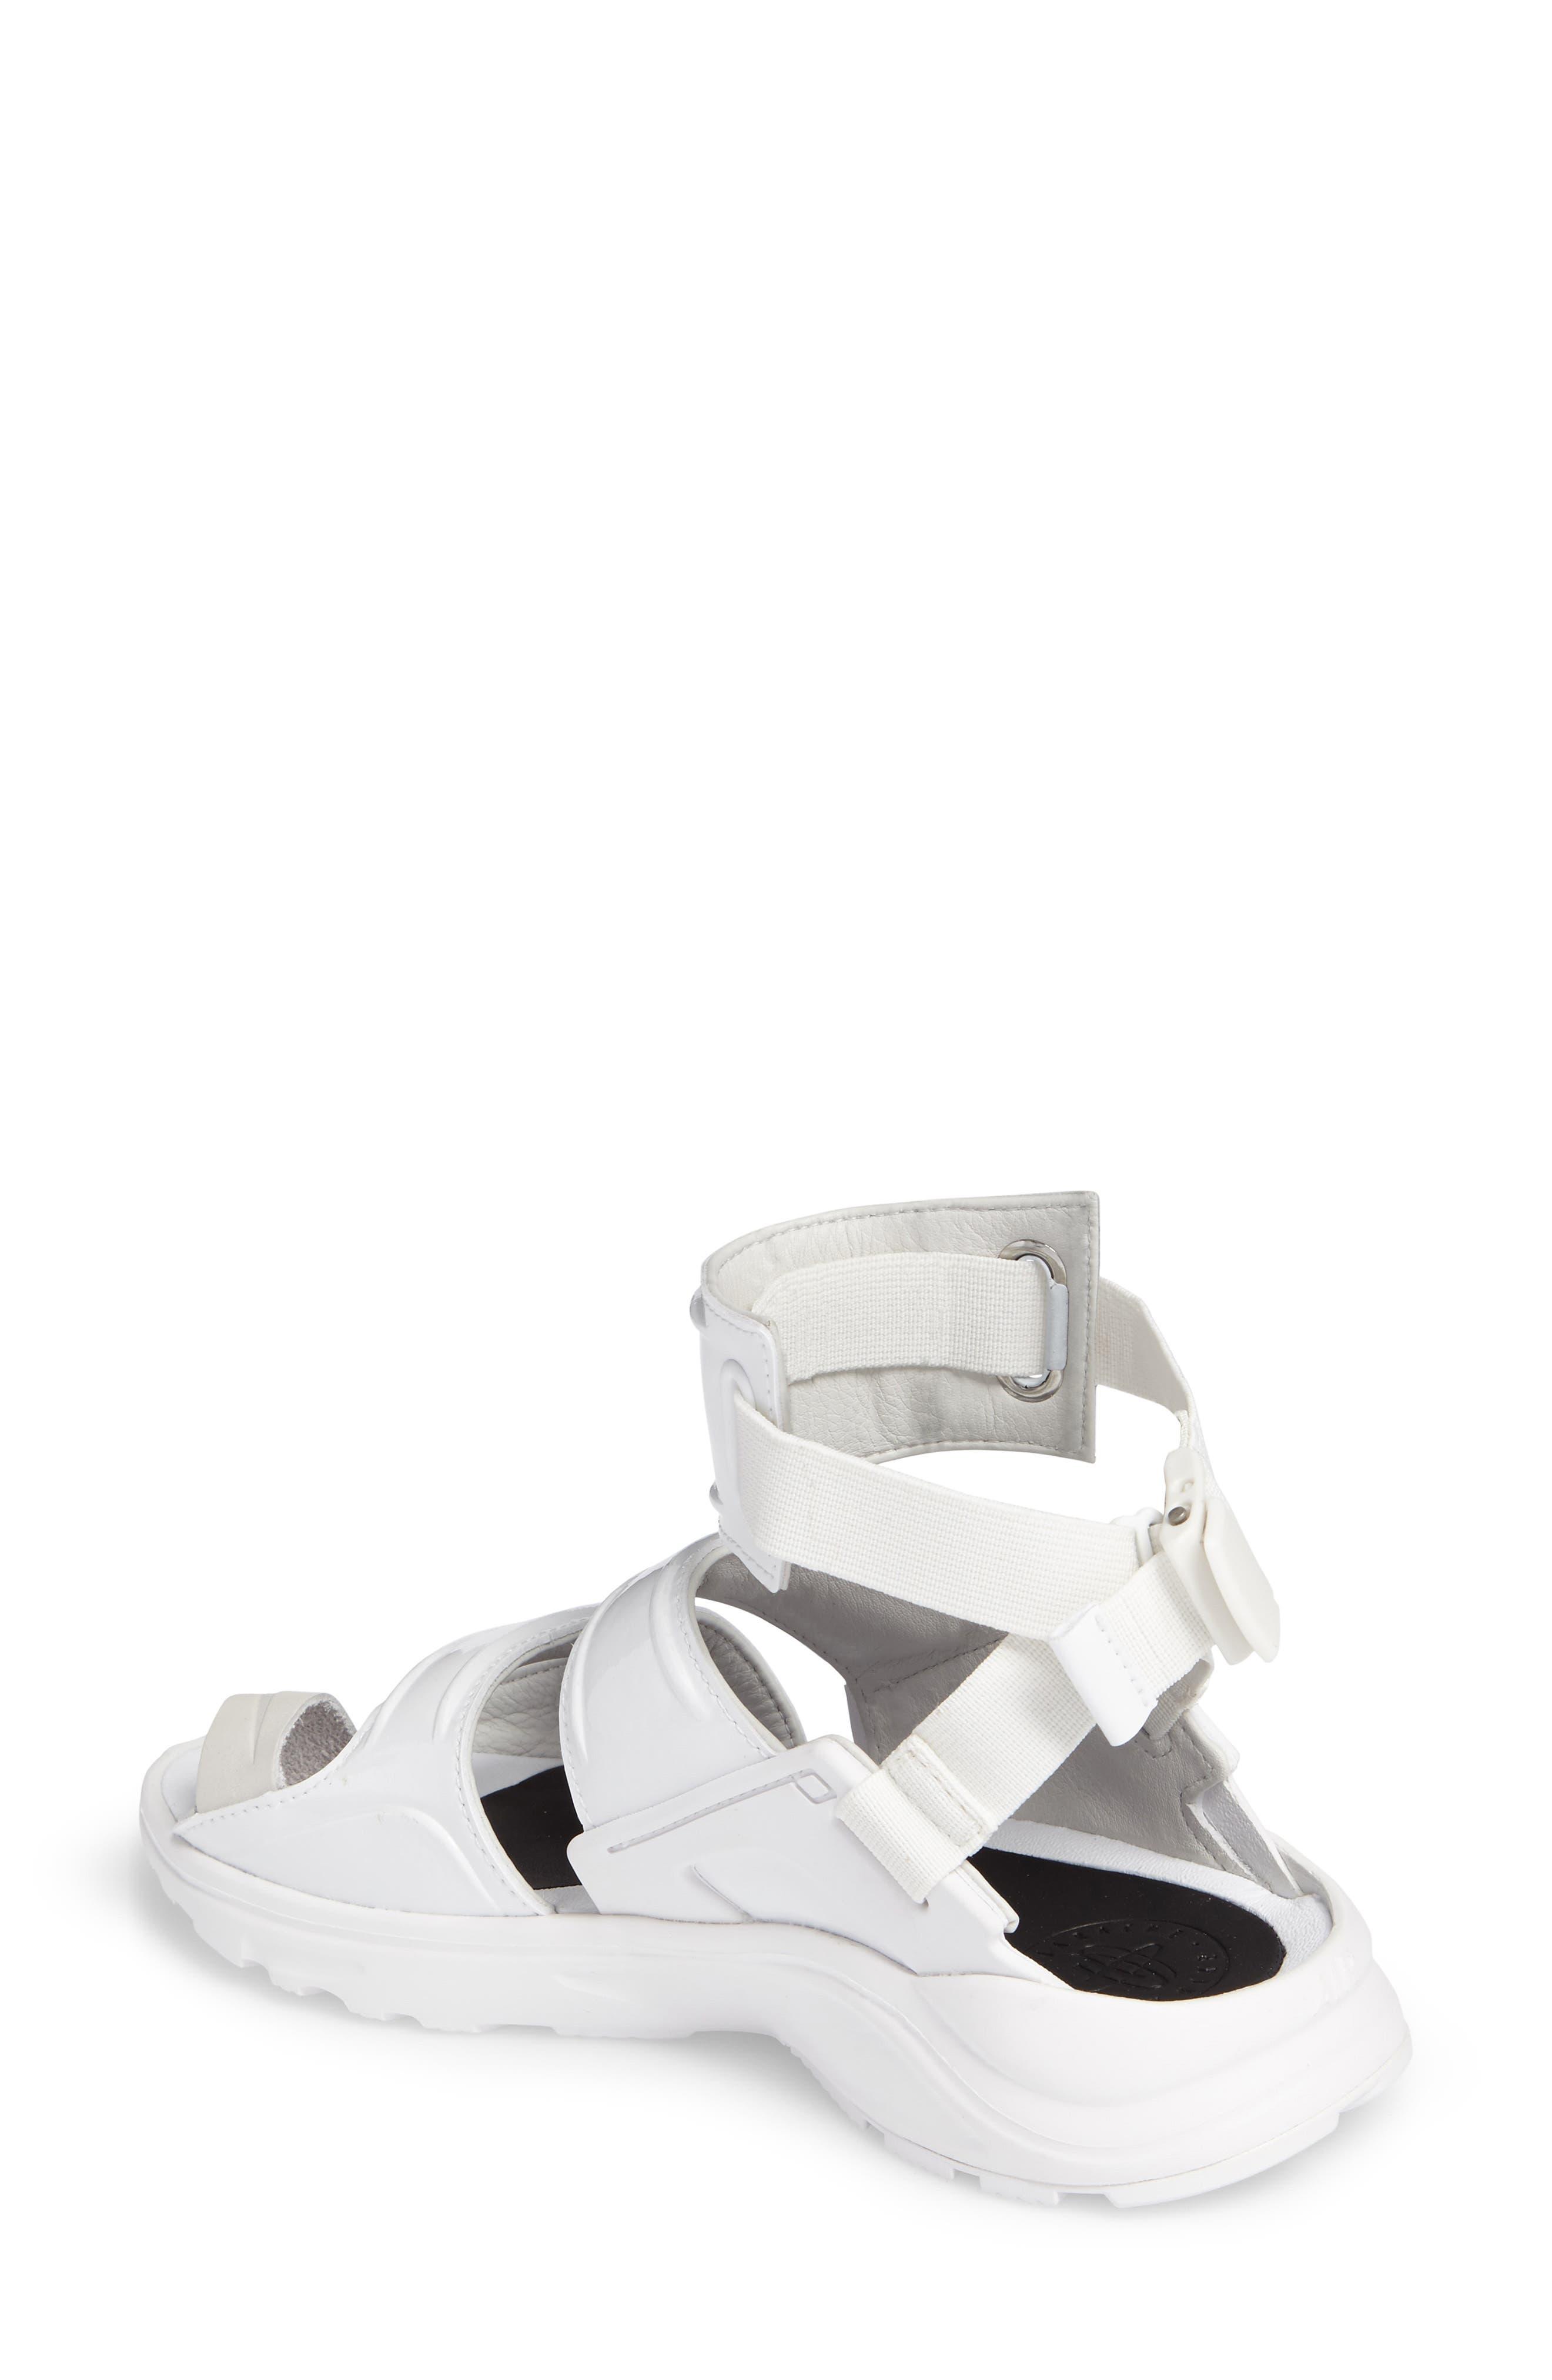 Alternate Image 2  - Nike Air Huarache Gladiator Sandal (Women)